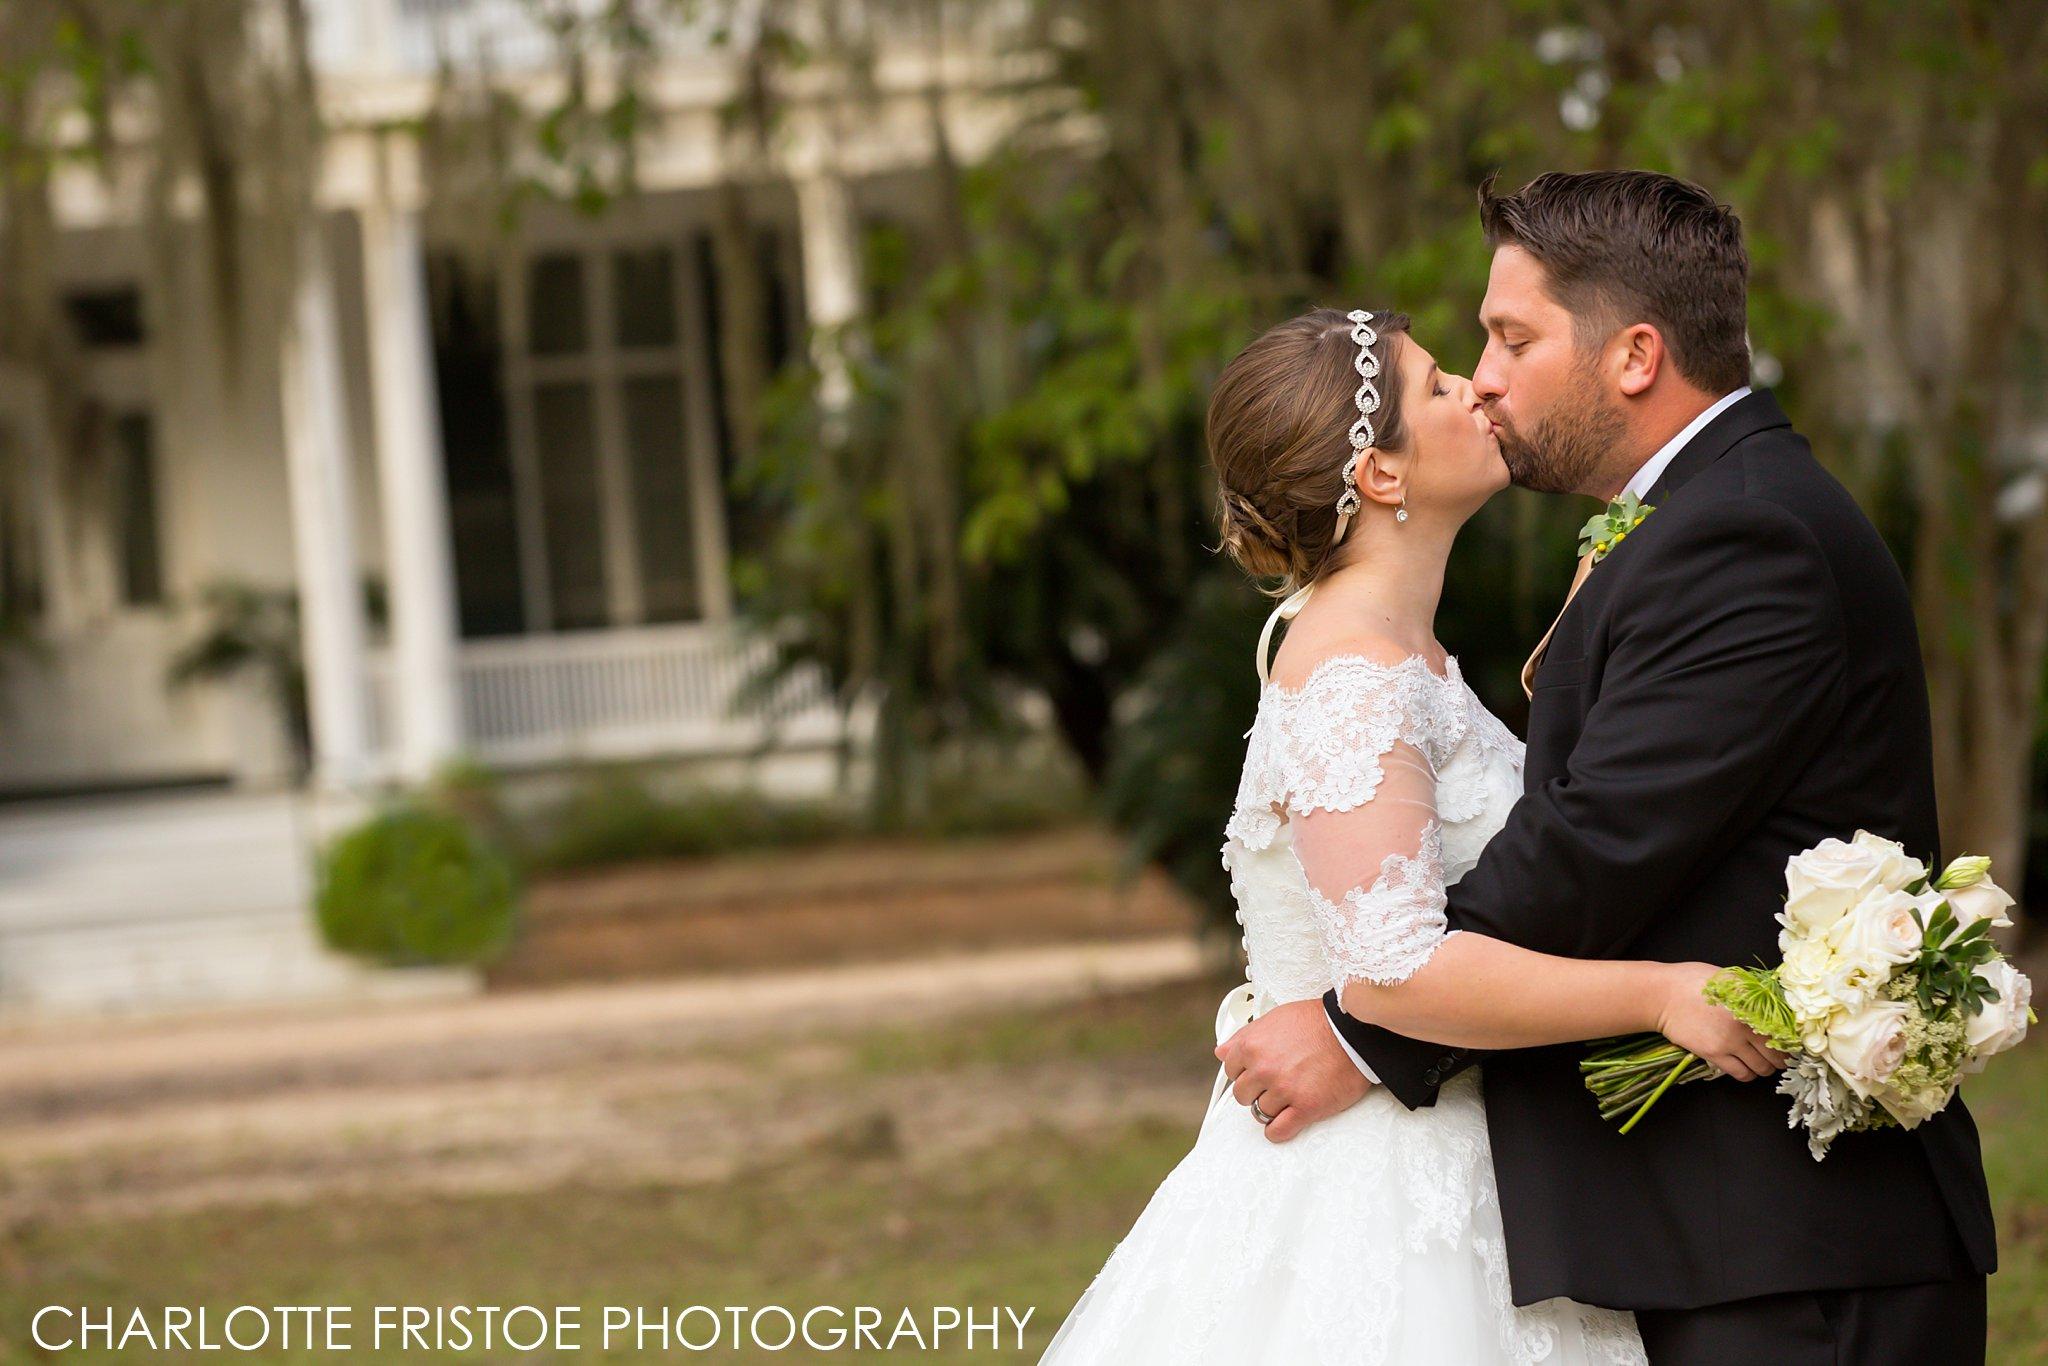 Charlotte Fristoe Photography Blog-31.jpg